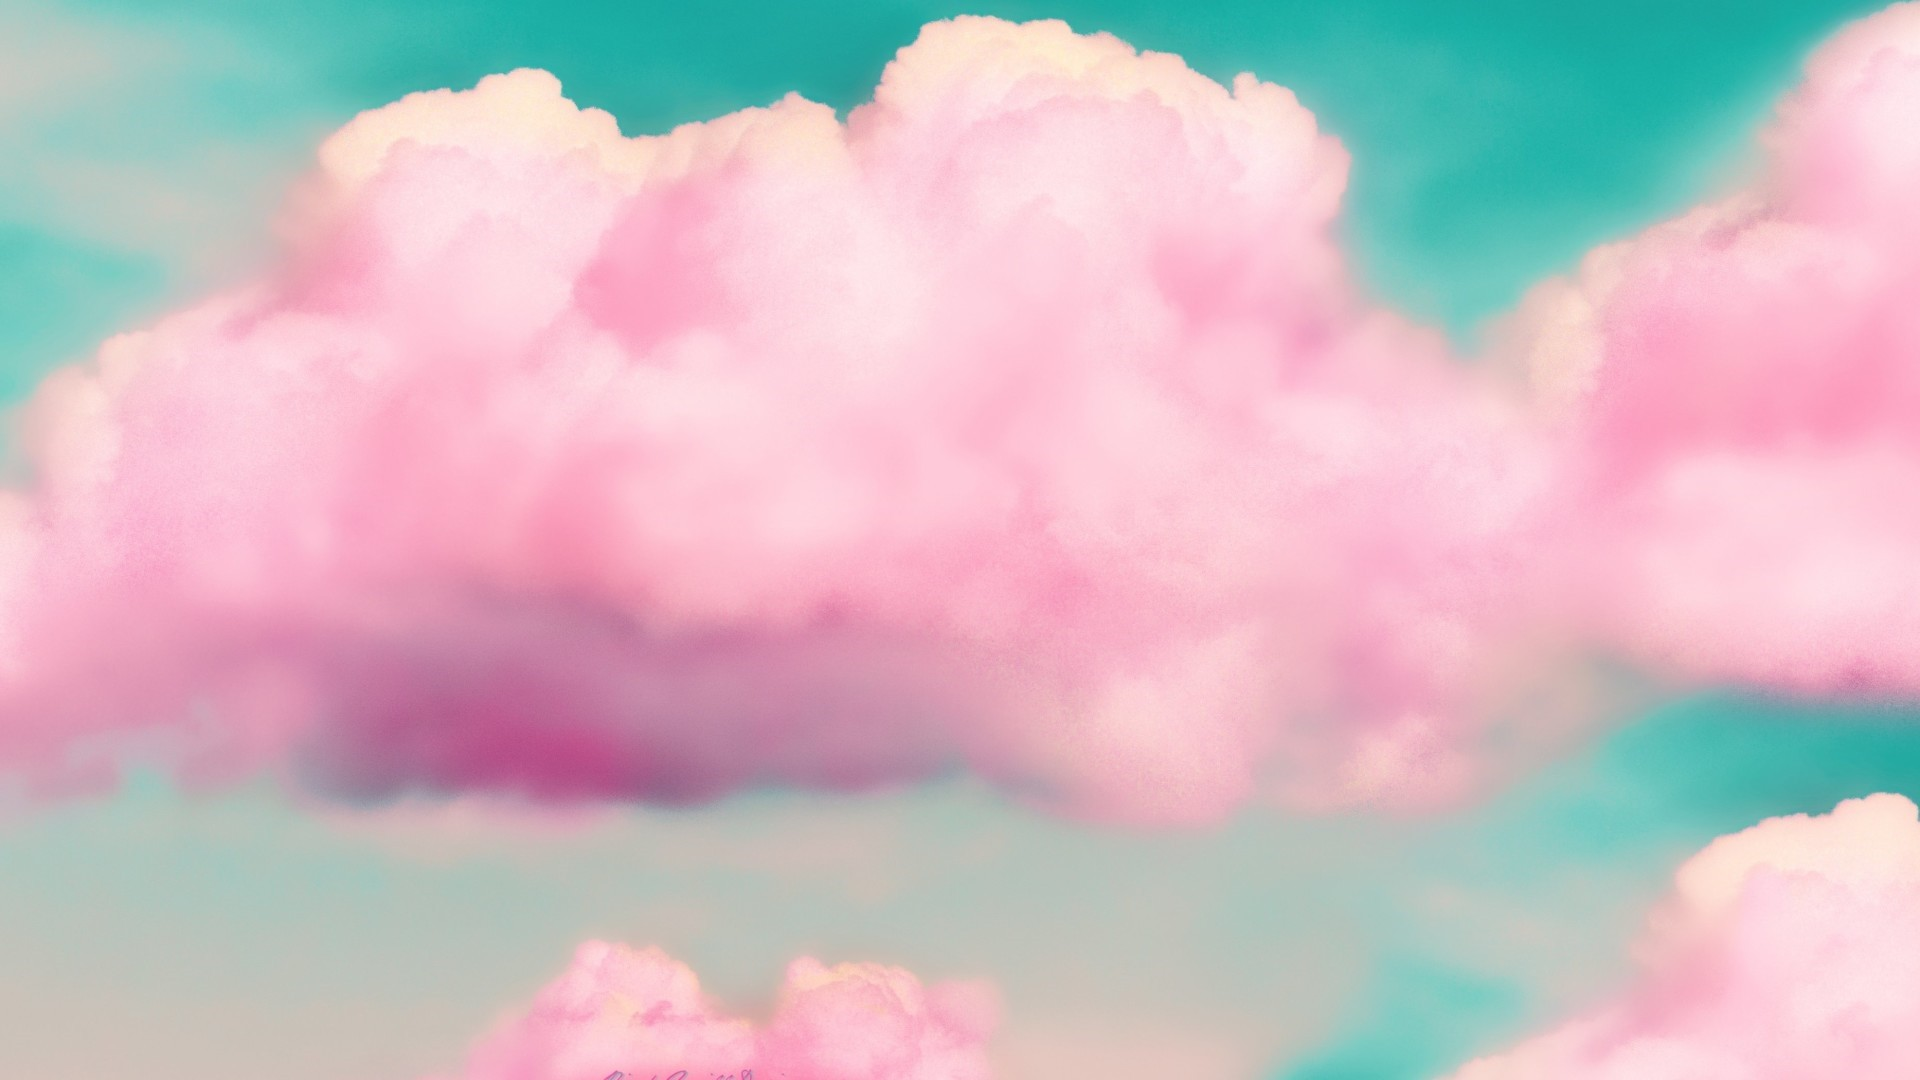 Pink Cloud HD Wallpaper